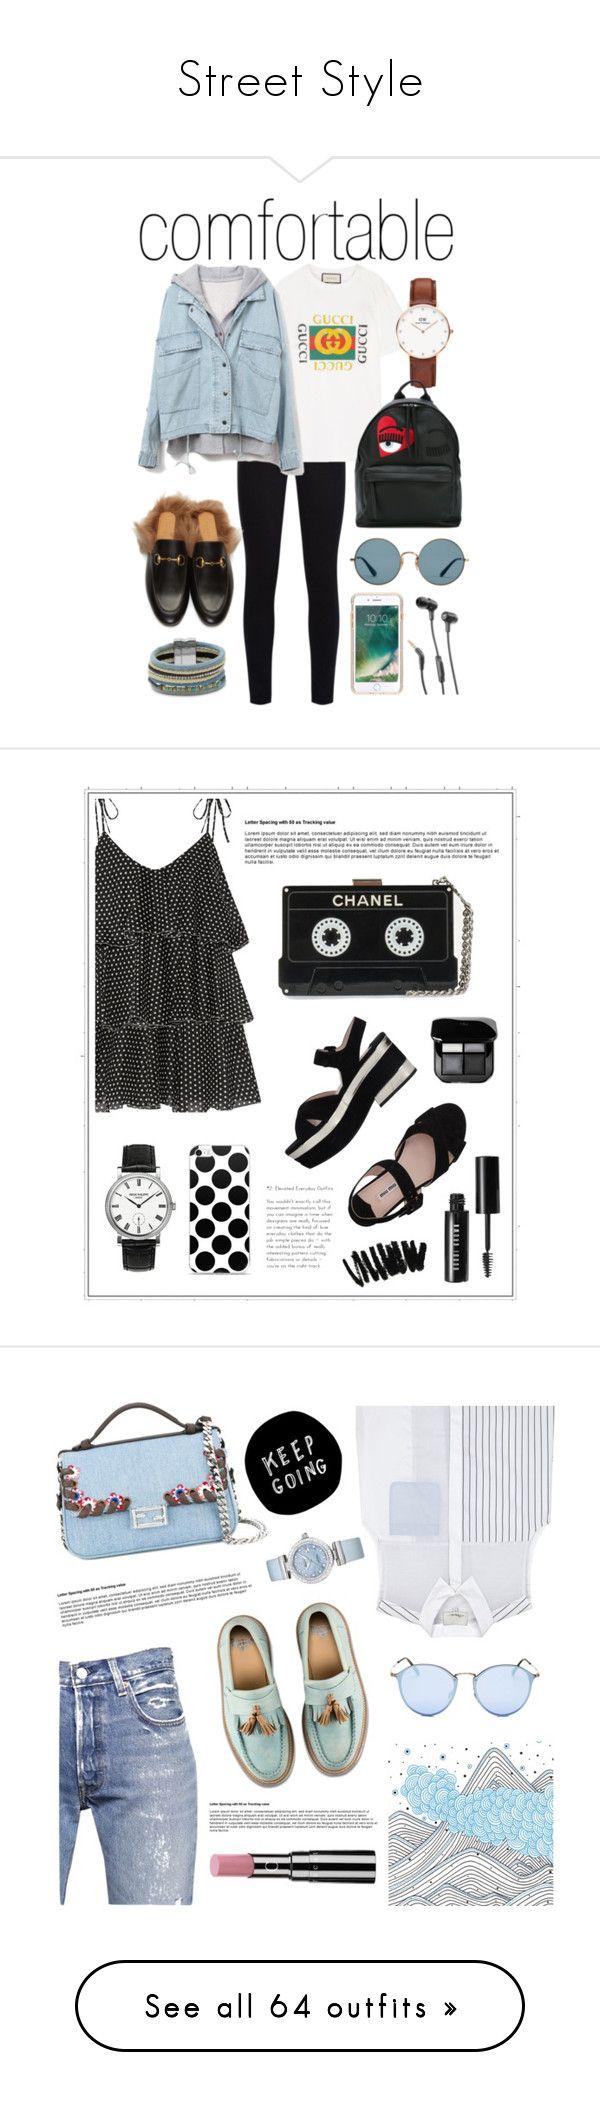 """Street Style"" by madedinorog ❤ liked on Polyvore featuring 7 For All Mankind, Gucci, Daniel Wellington, Chiara Ferragni, Ray-Ban, Griffin, JBL, Design Lab, Miu Miu and Lisa Marie Fernandez"